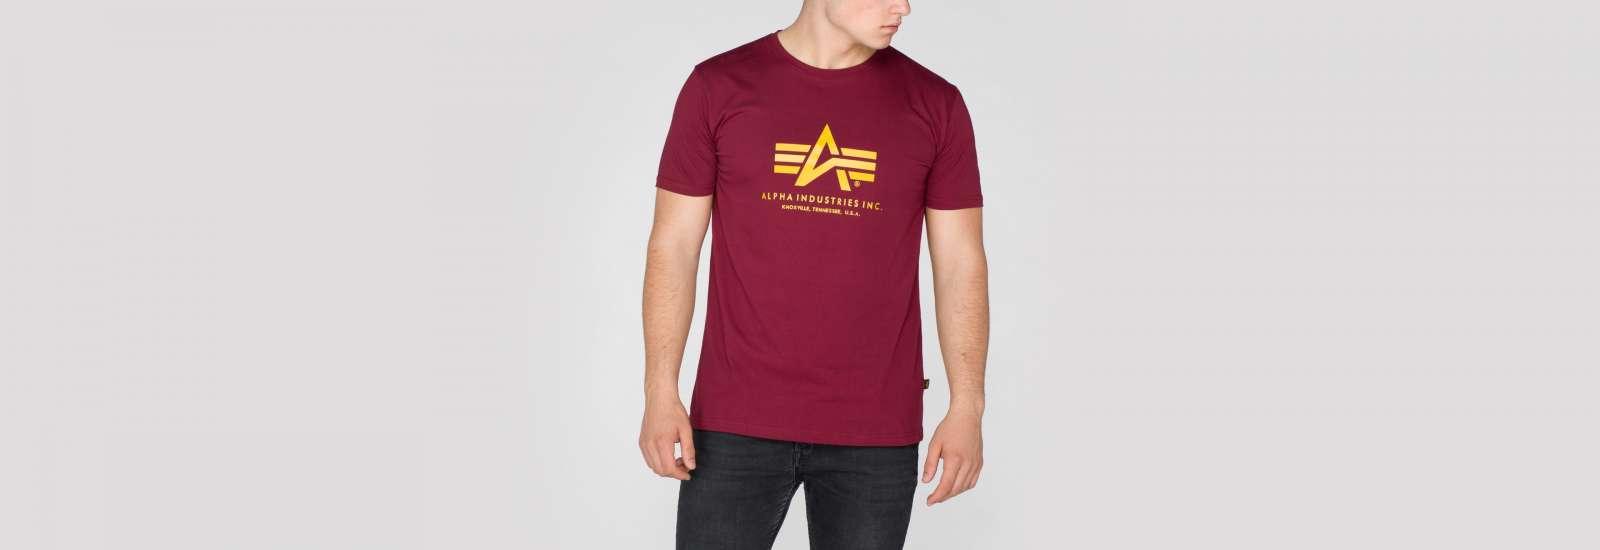 100501-184-alpha-industries-basic-t-t-shirt-001_800x800@2x